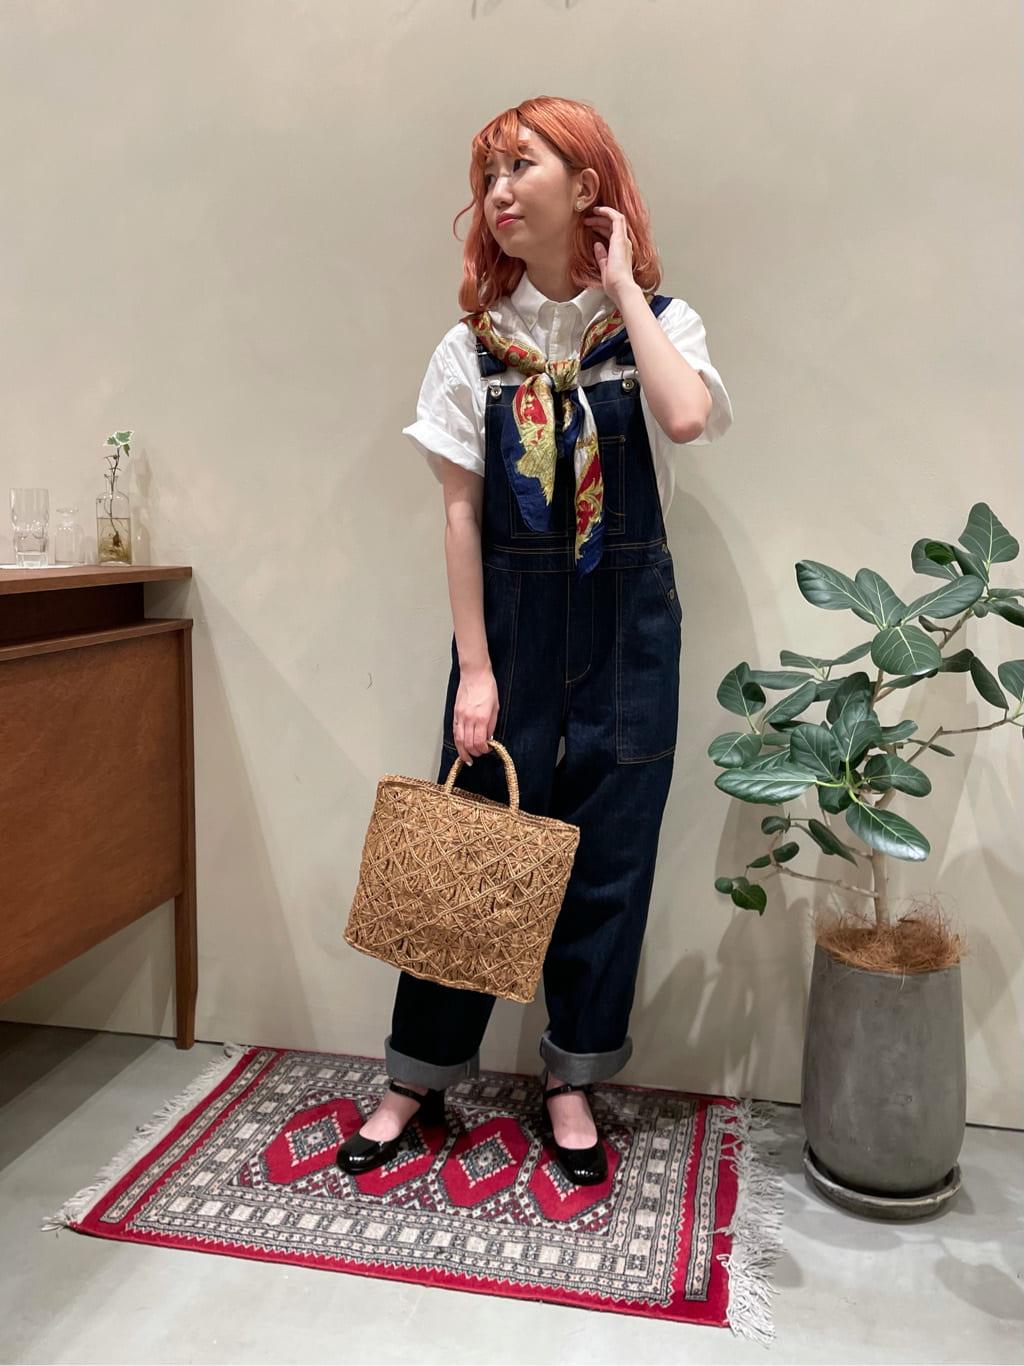 - CHILD WOMAN CHILD WOMAN , PAR ICI 東京スカイツリータウン・ソラマチ 身長:160cm 2021.06.29